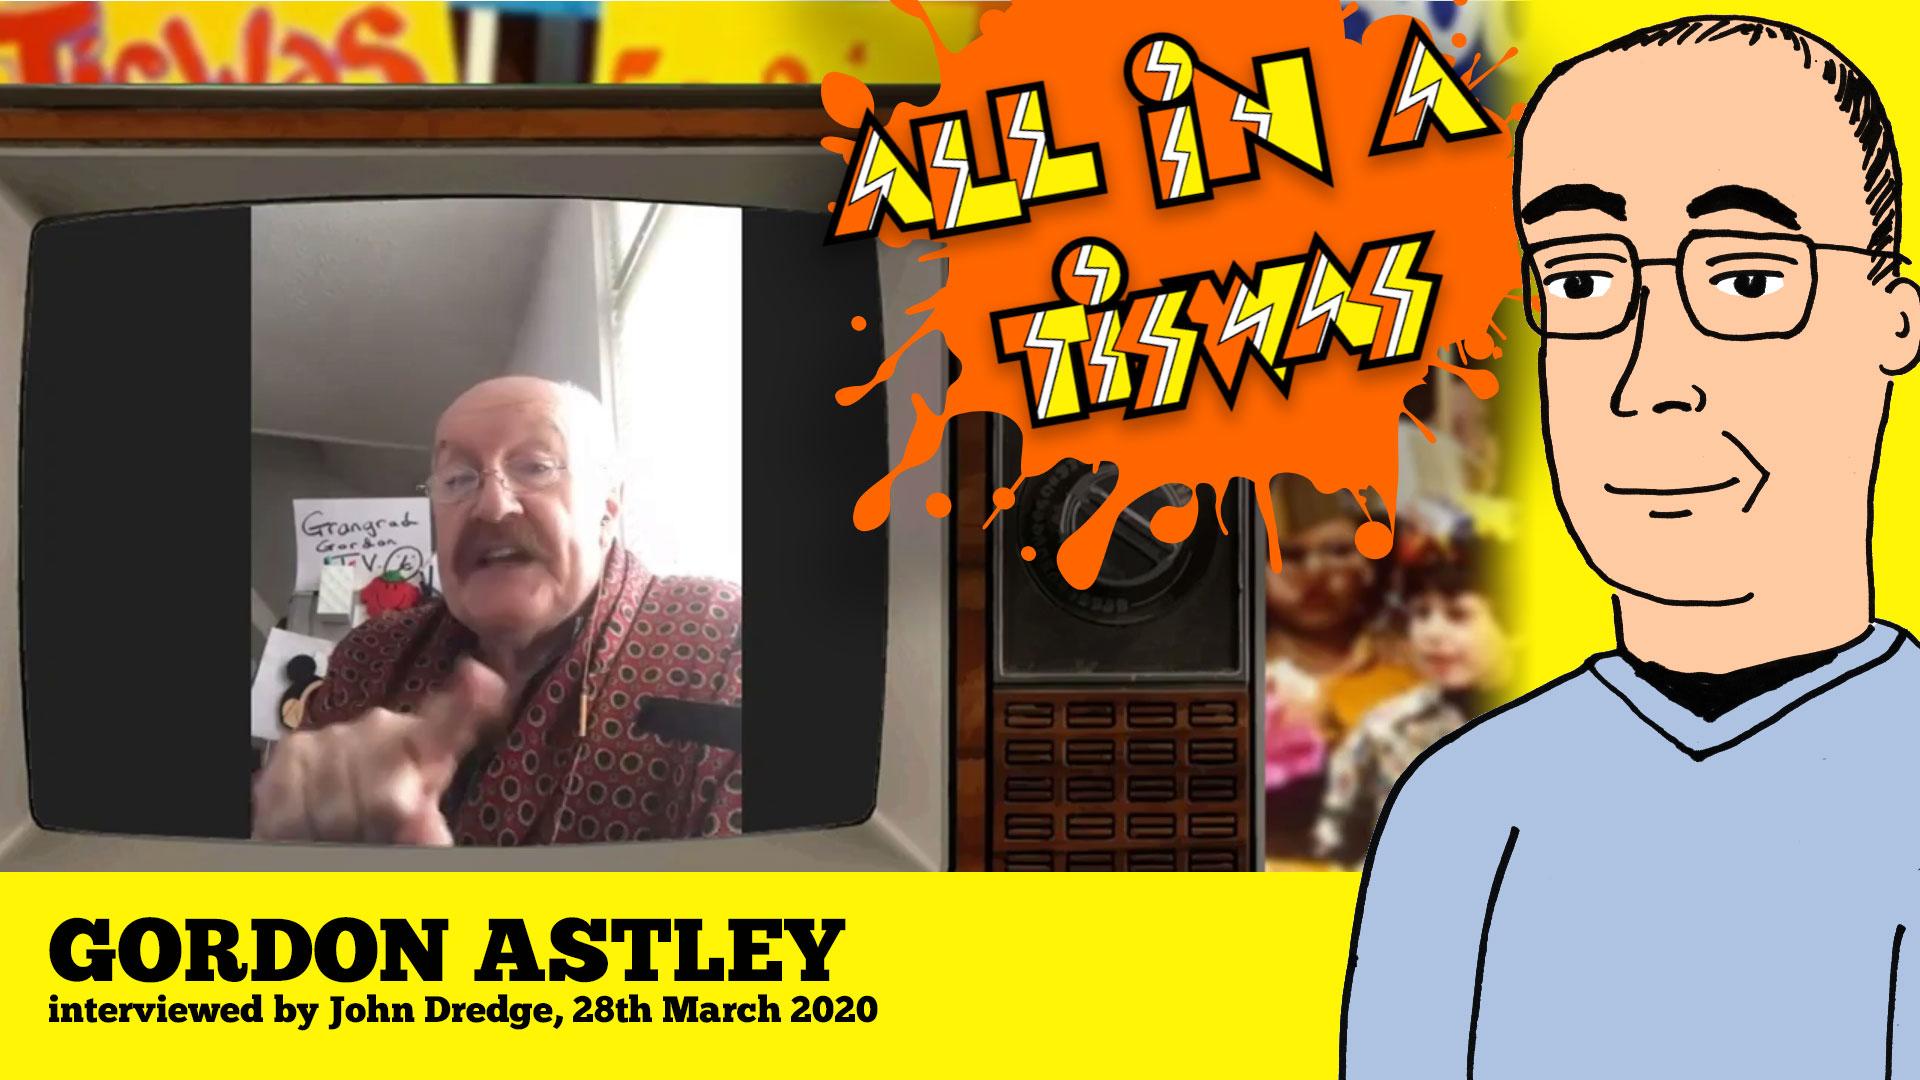 Gordon Astley interviewed by John Dredge